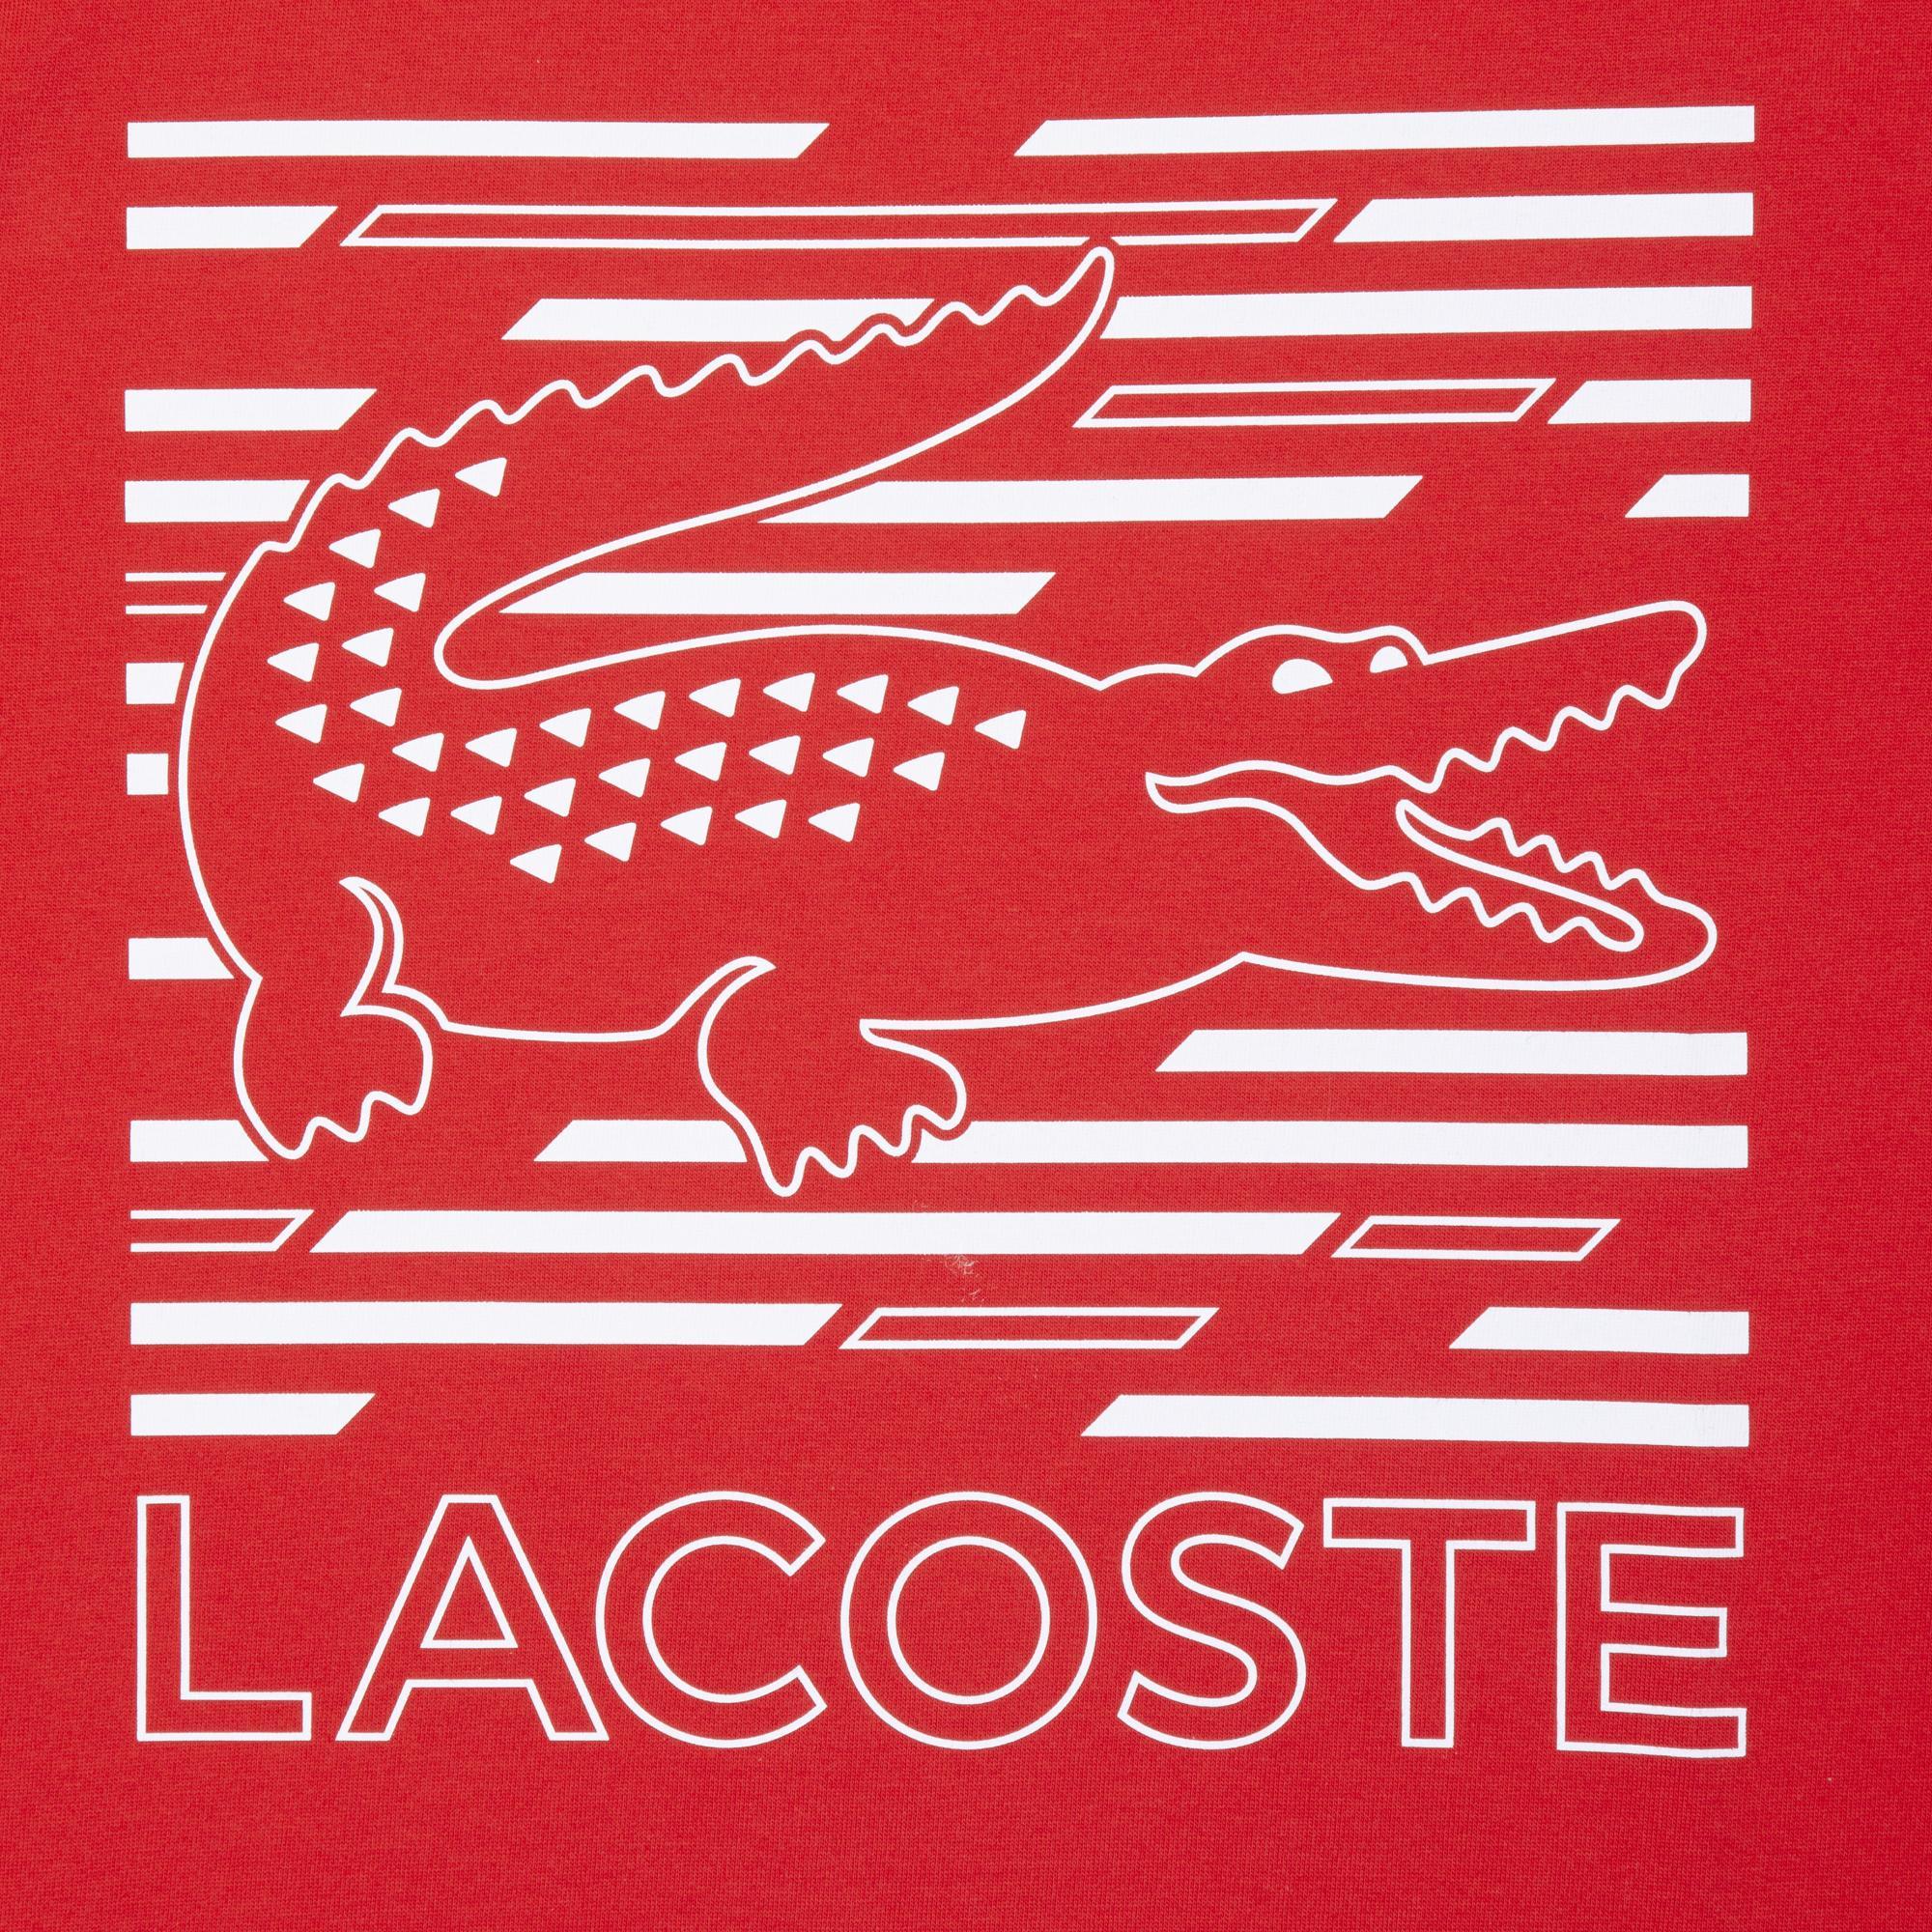 Lacoste Men's Sport Crocodile Printed Breathable T-Shirt